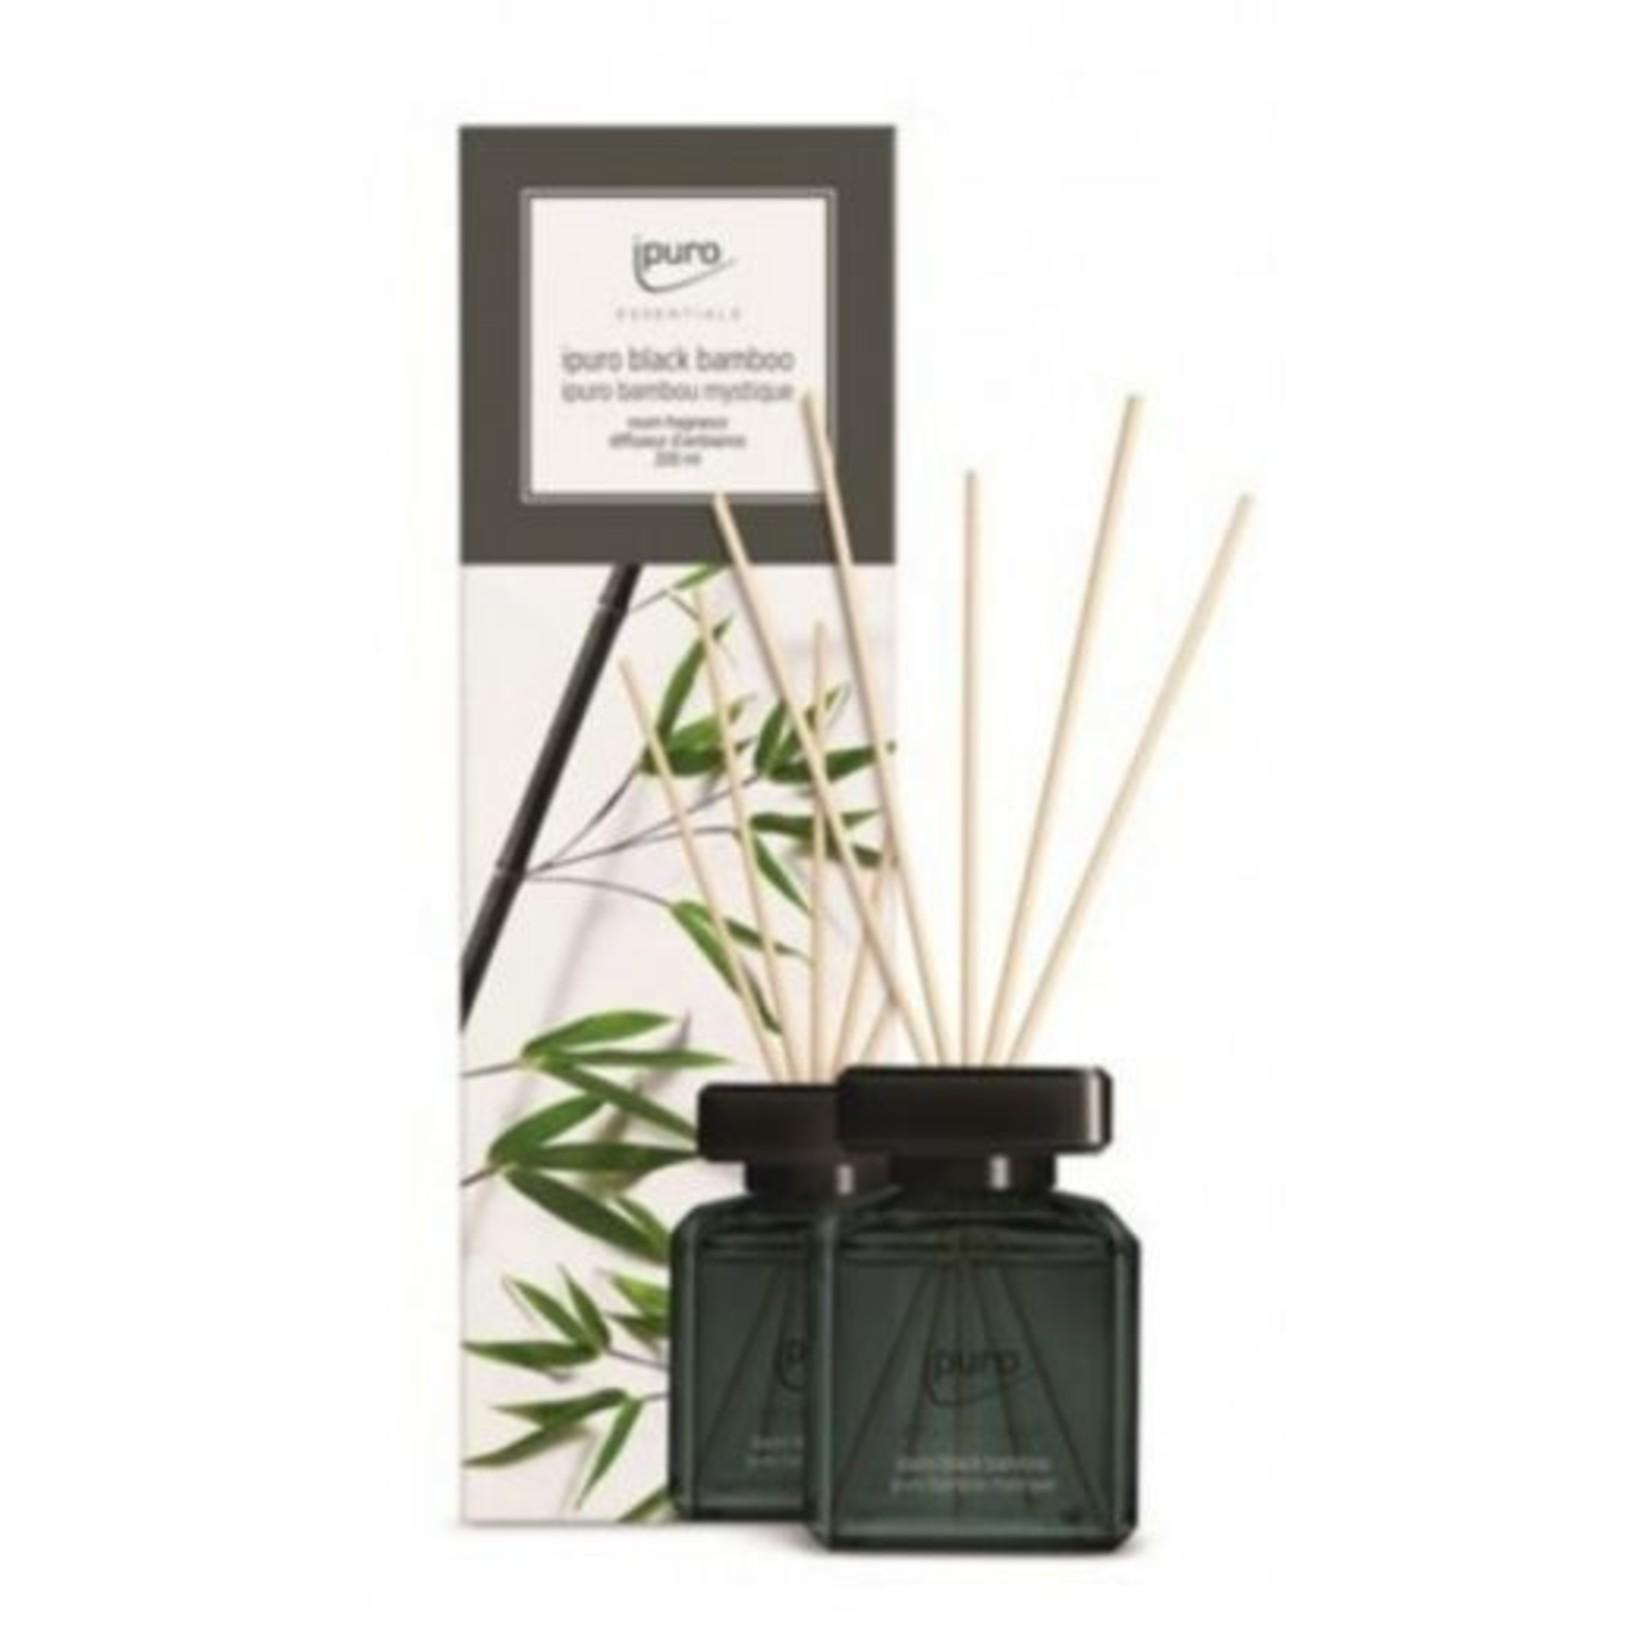 Ipuro Geurstokjes - Black bamboo - 200ml